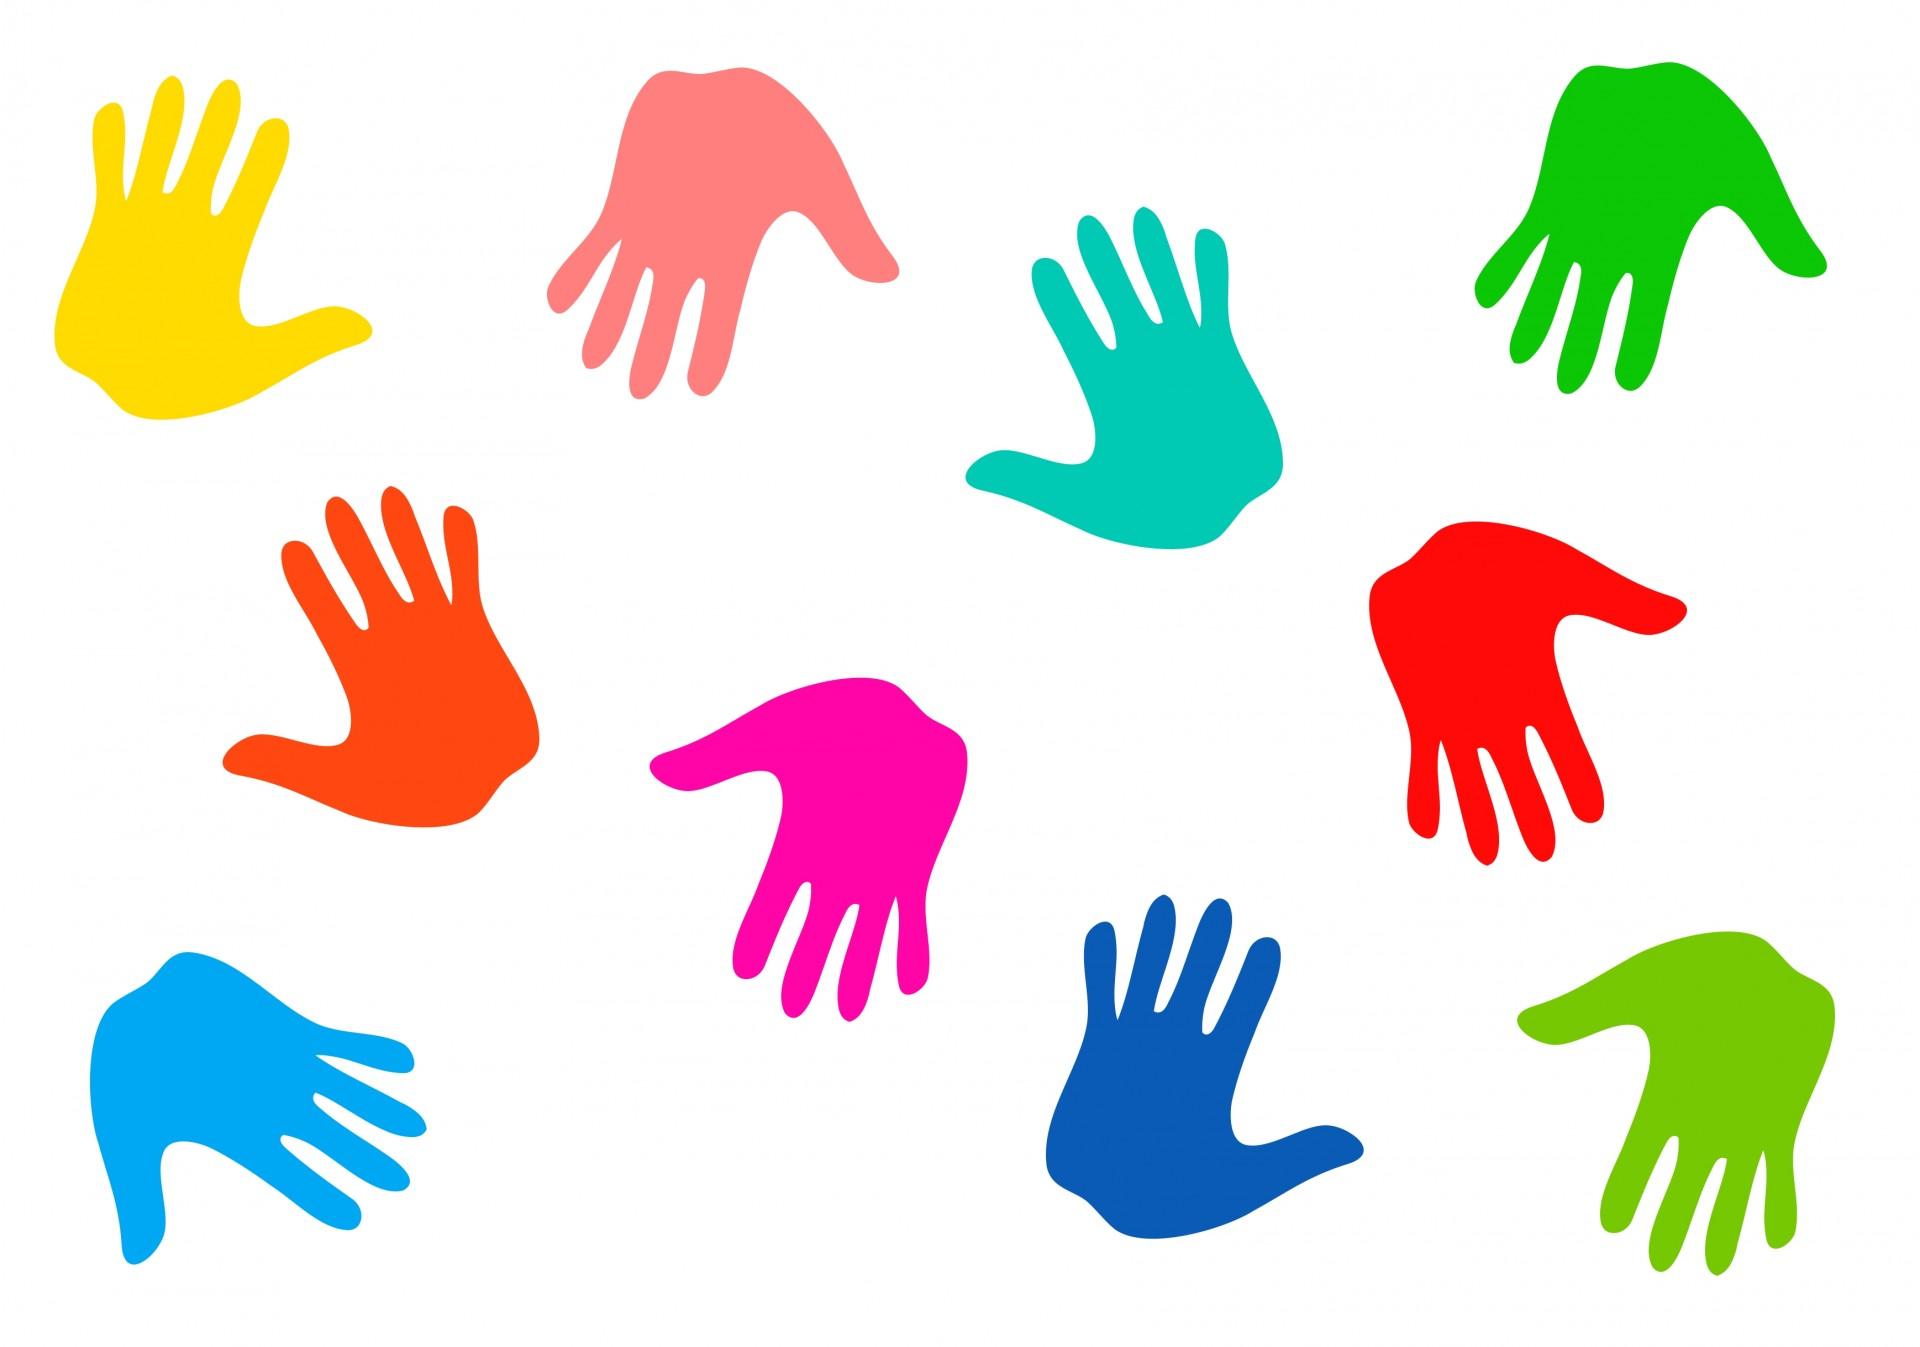 1920x1347 Colourful Handprints Free Stock Photo